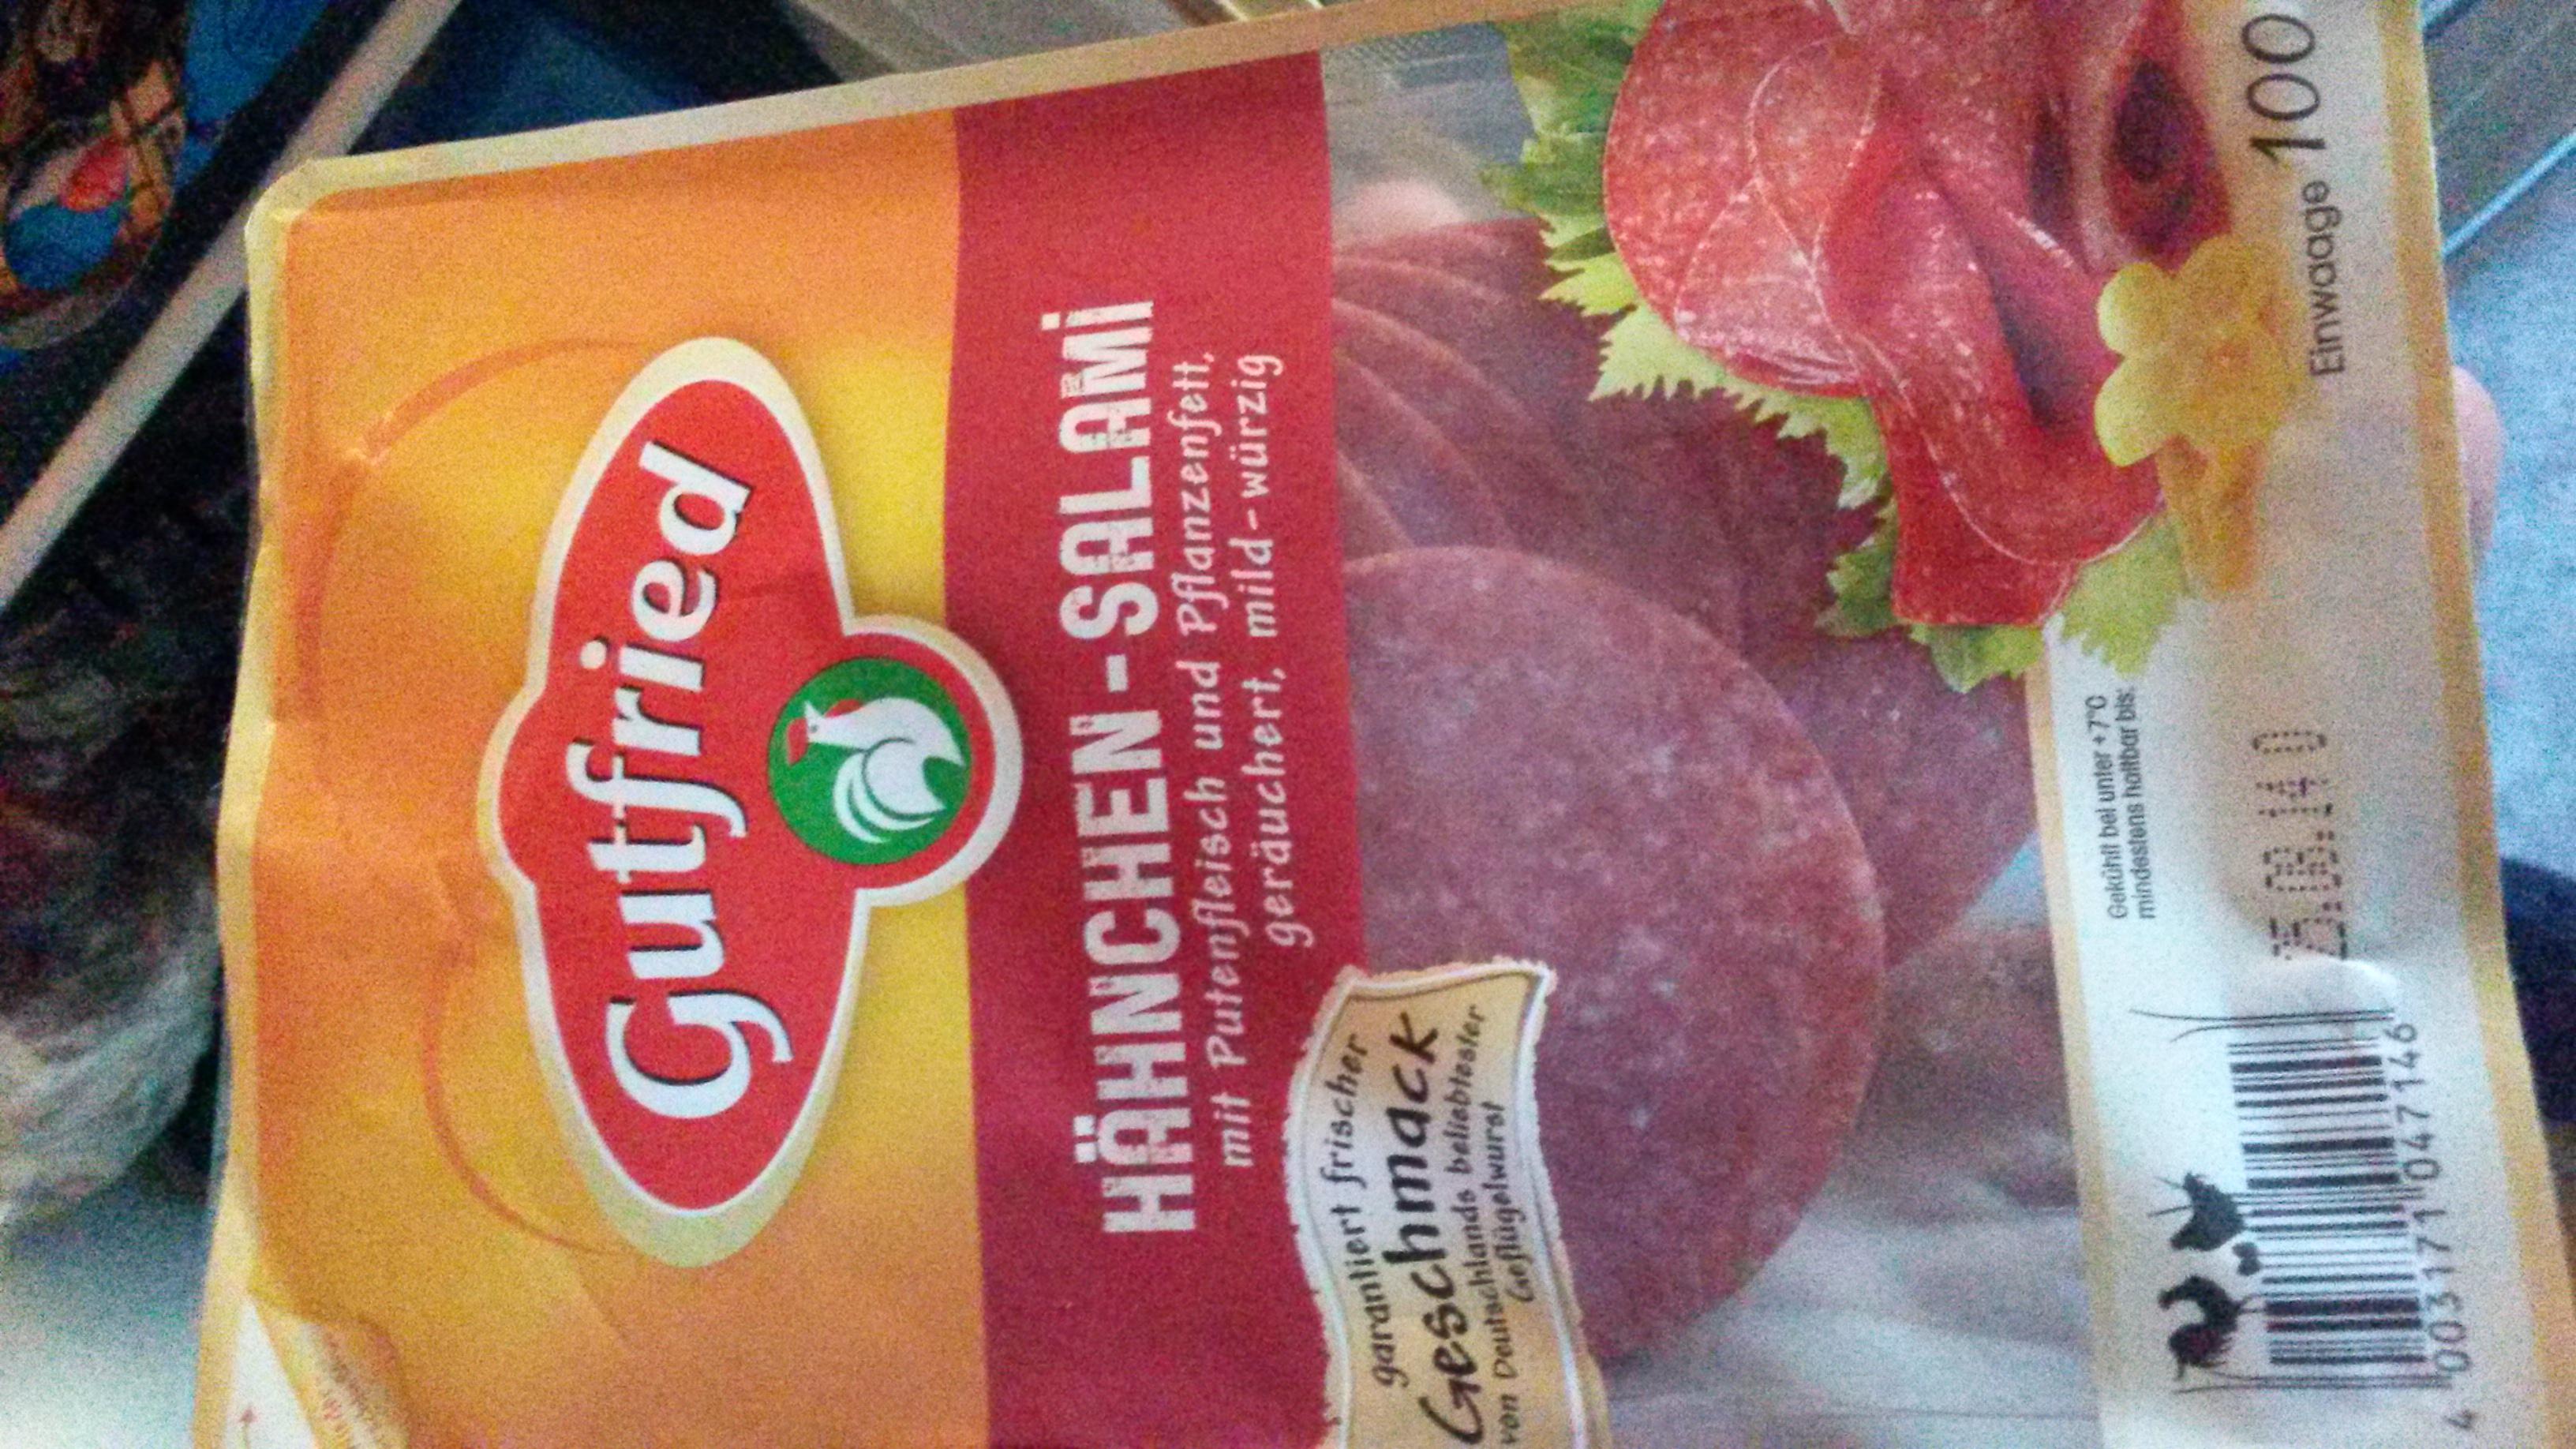 Geflügel Salami